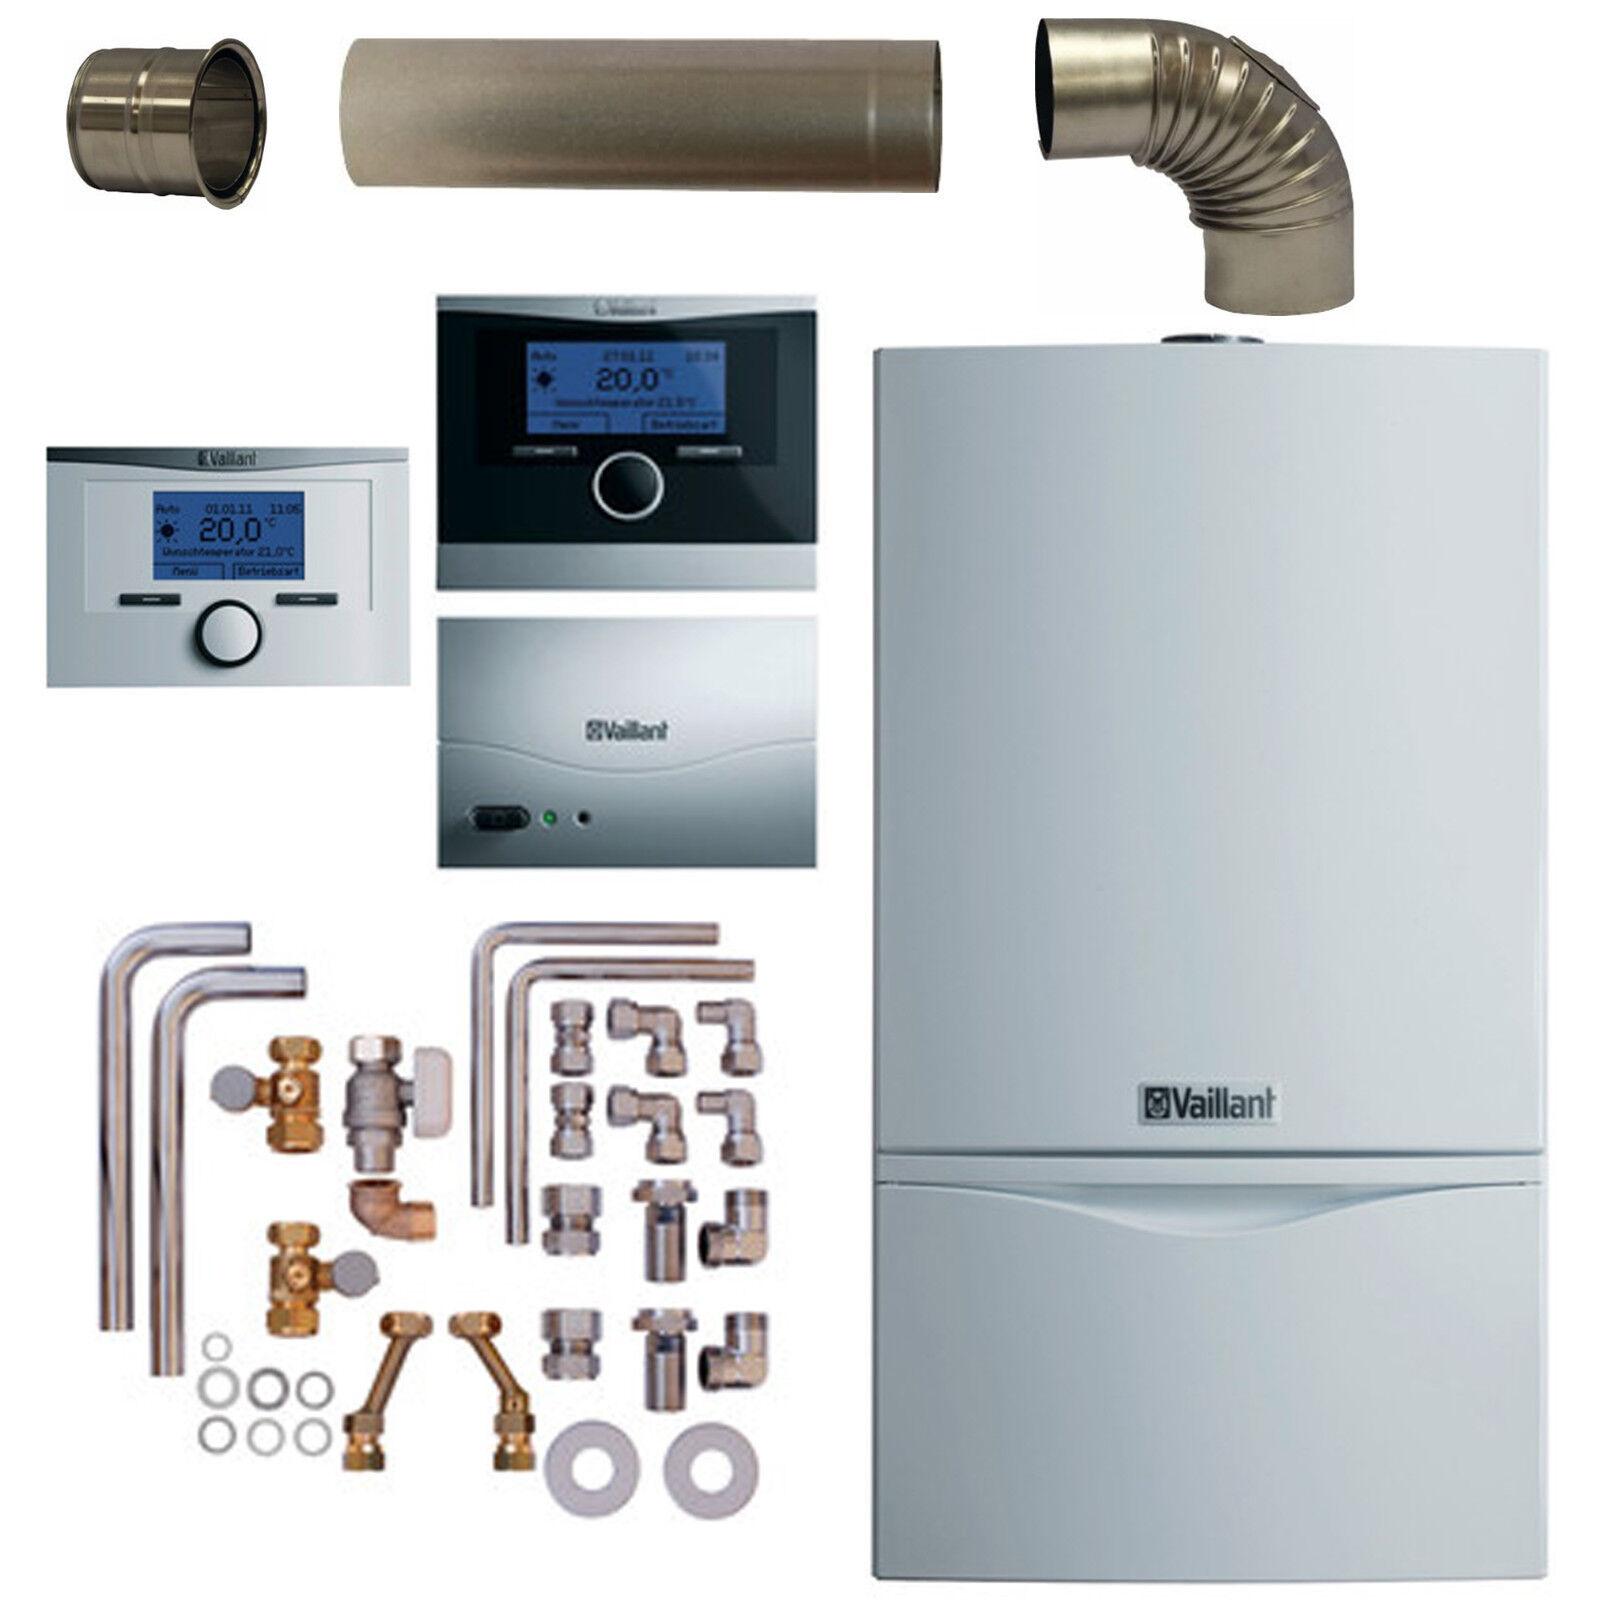 buderus gas brennwert therme gb172 set abgassystem. Black Bedroom Furniture Sets. Home Design Ideas